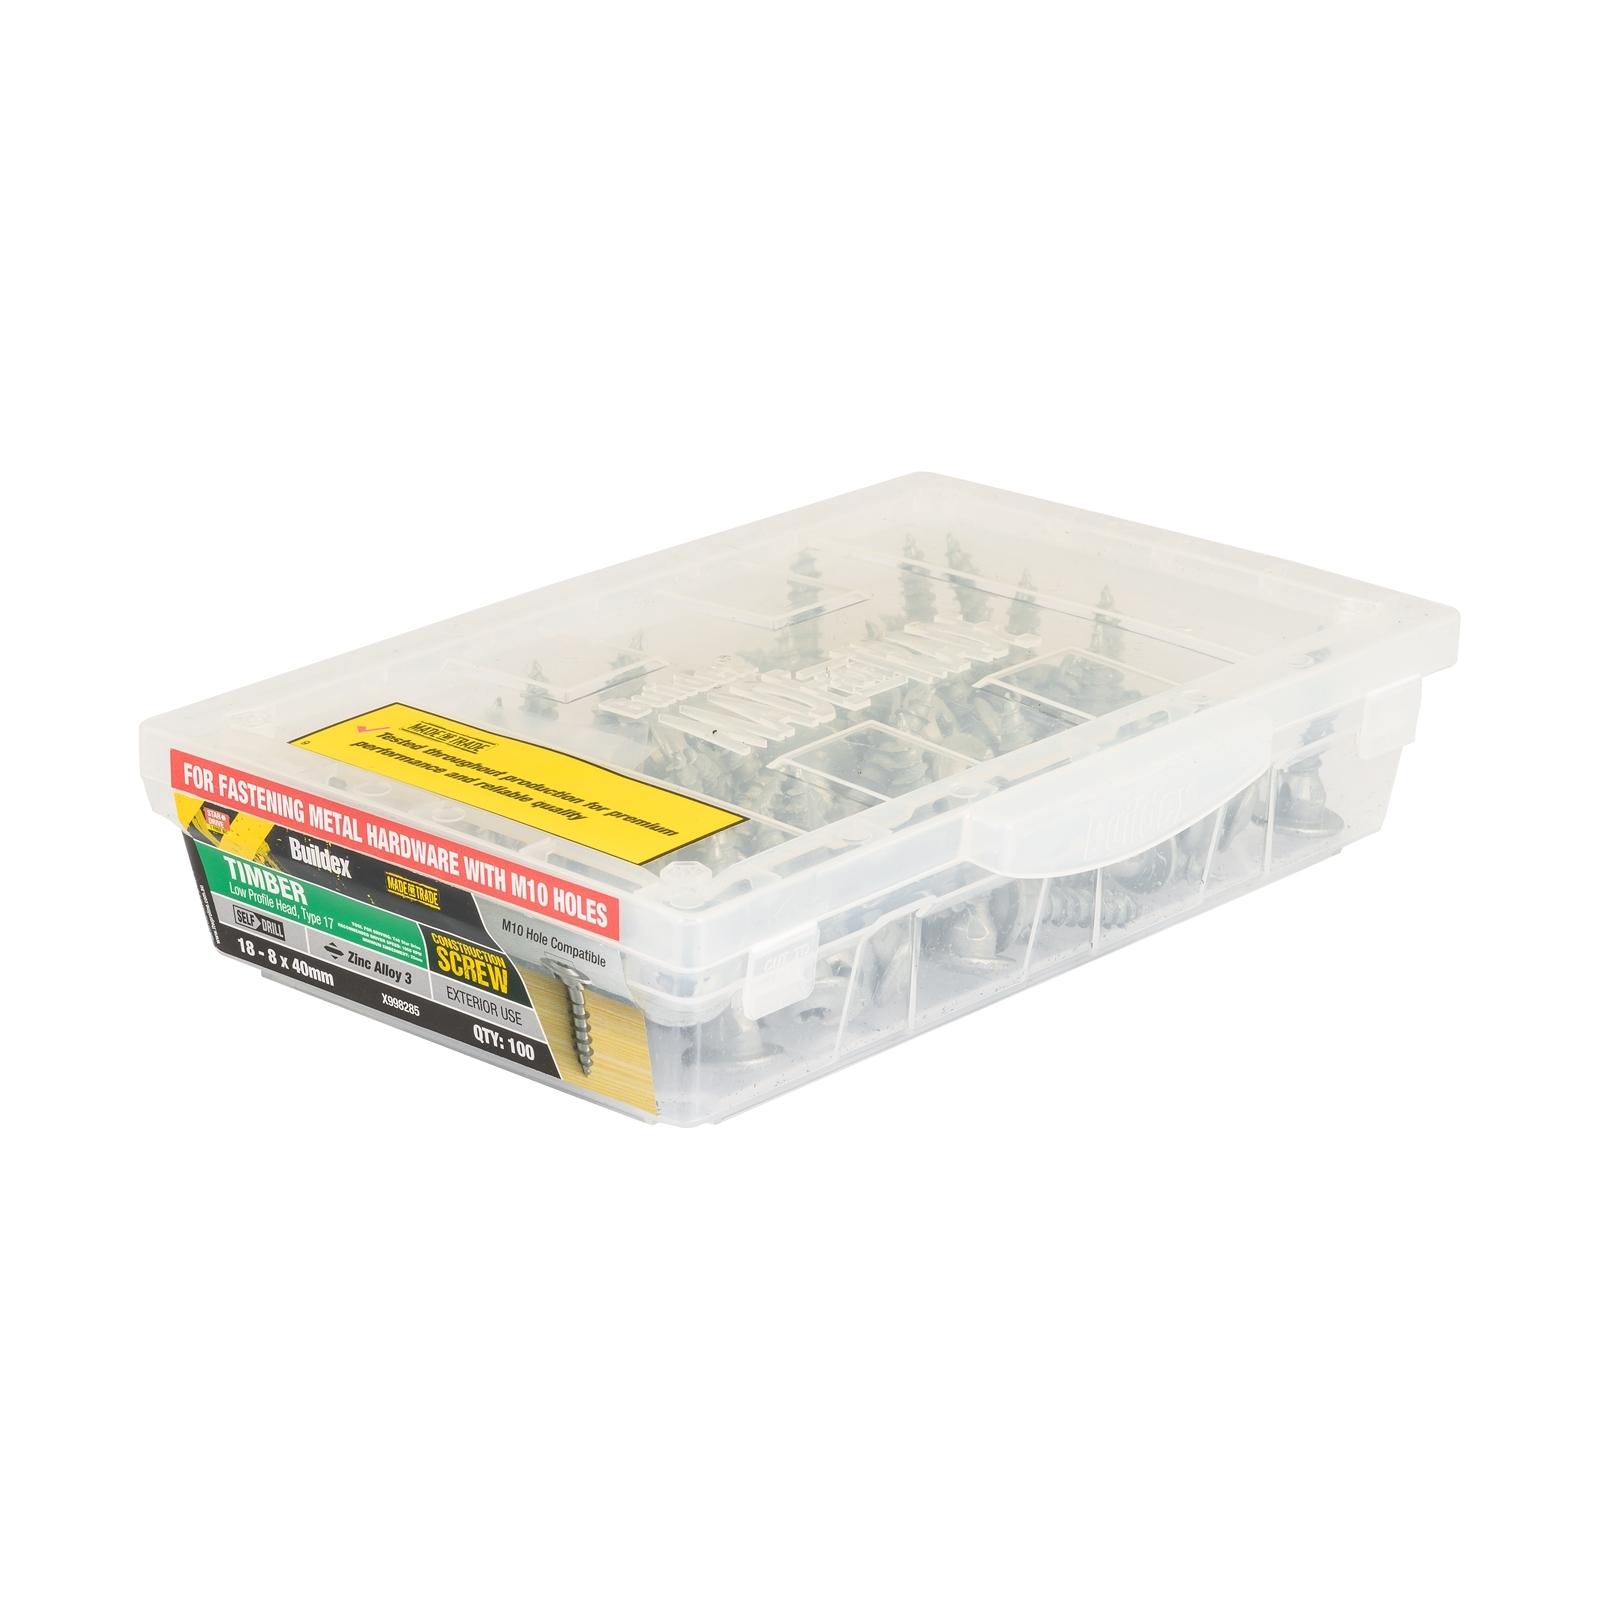 Buildex® 18 - 8 x 40 mm Zinc Alloy 3 Star Head Timber Construction Screws - 100 Pack